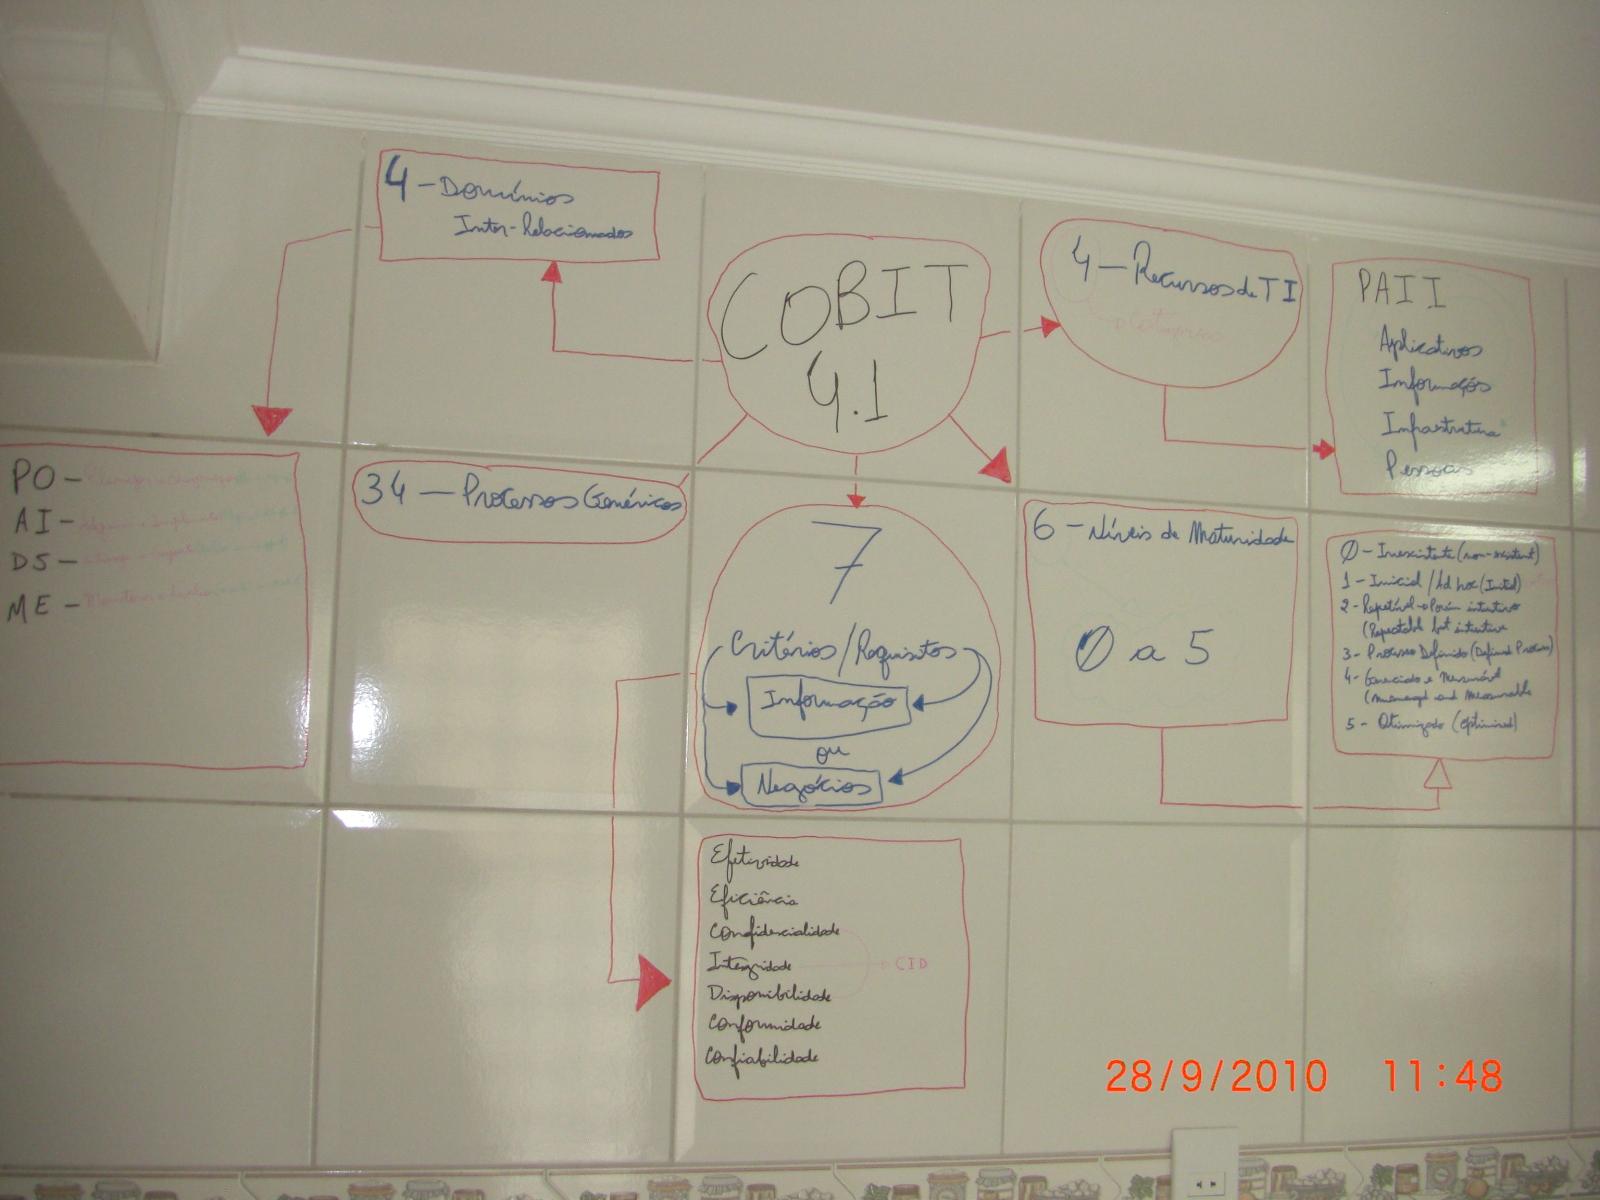 CobiT 4.1: Mapa mental Tabajara versão 1.1